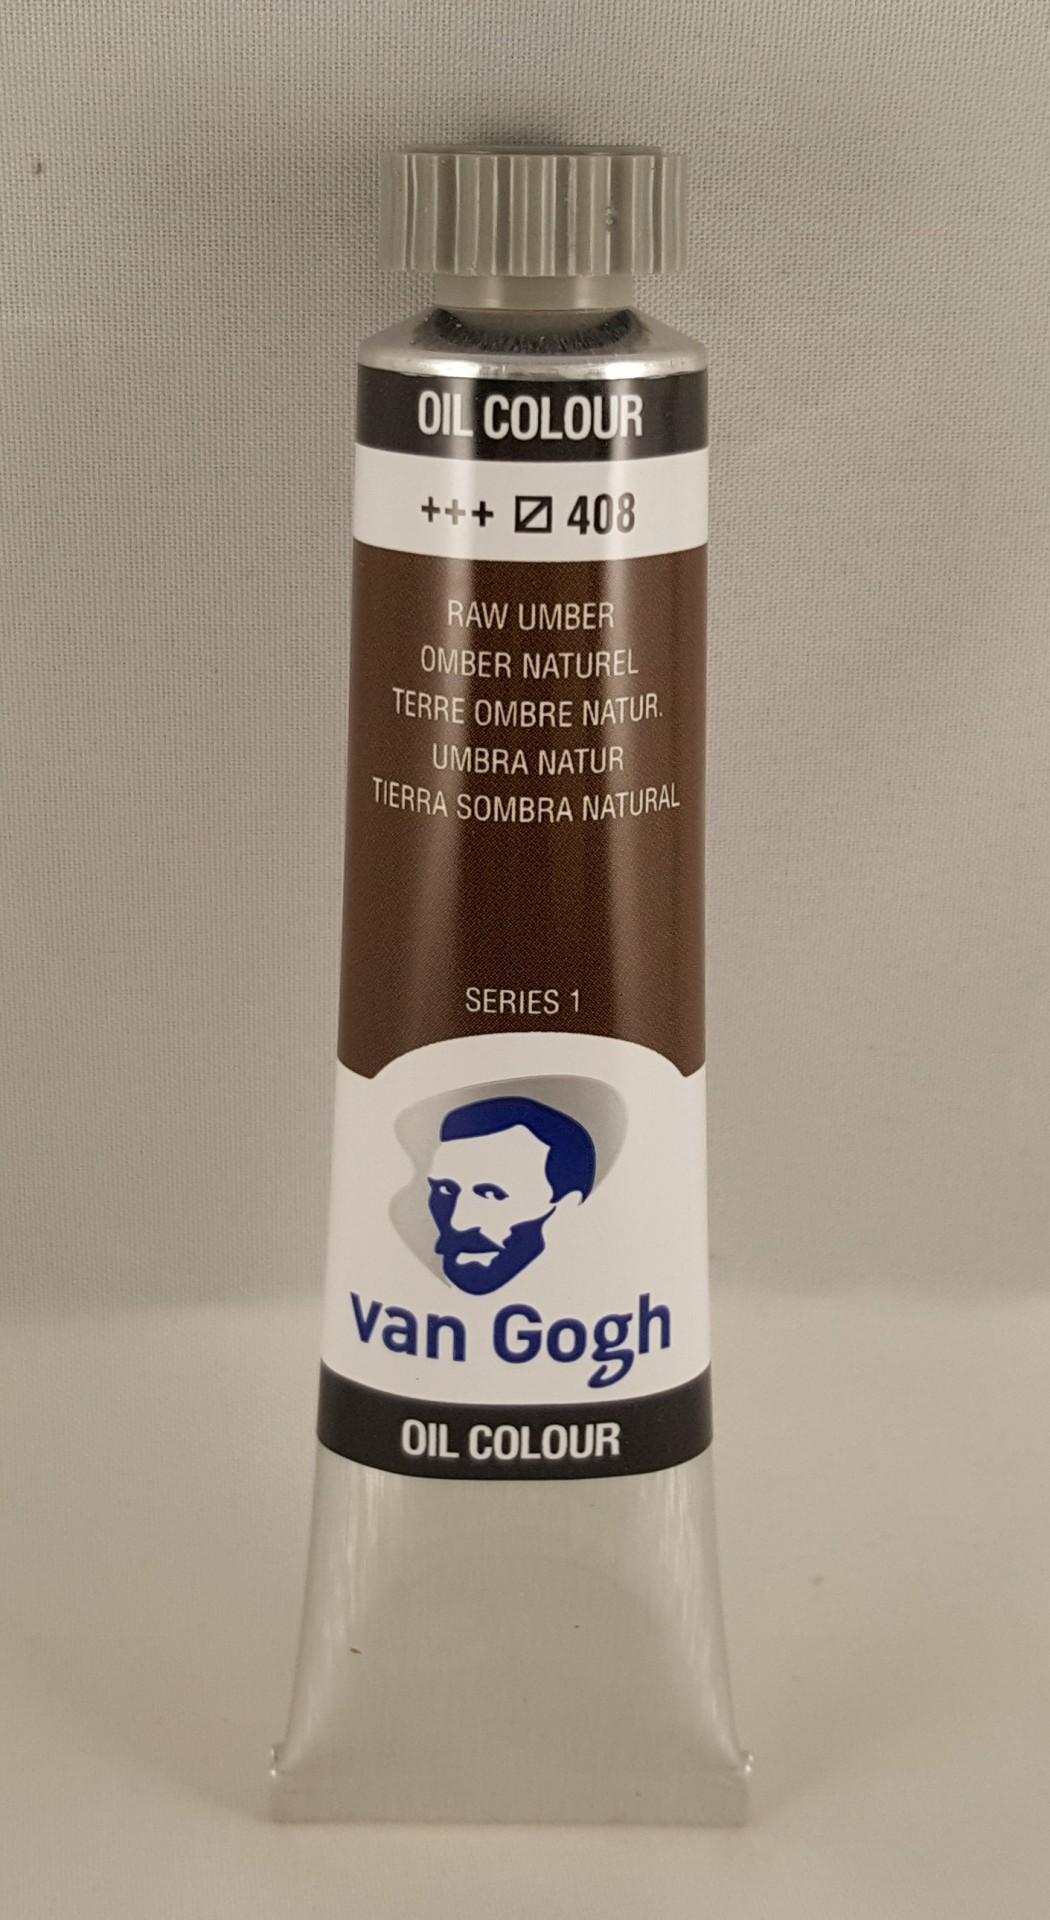 Tinta de óleo Van Gogh raw umber